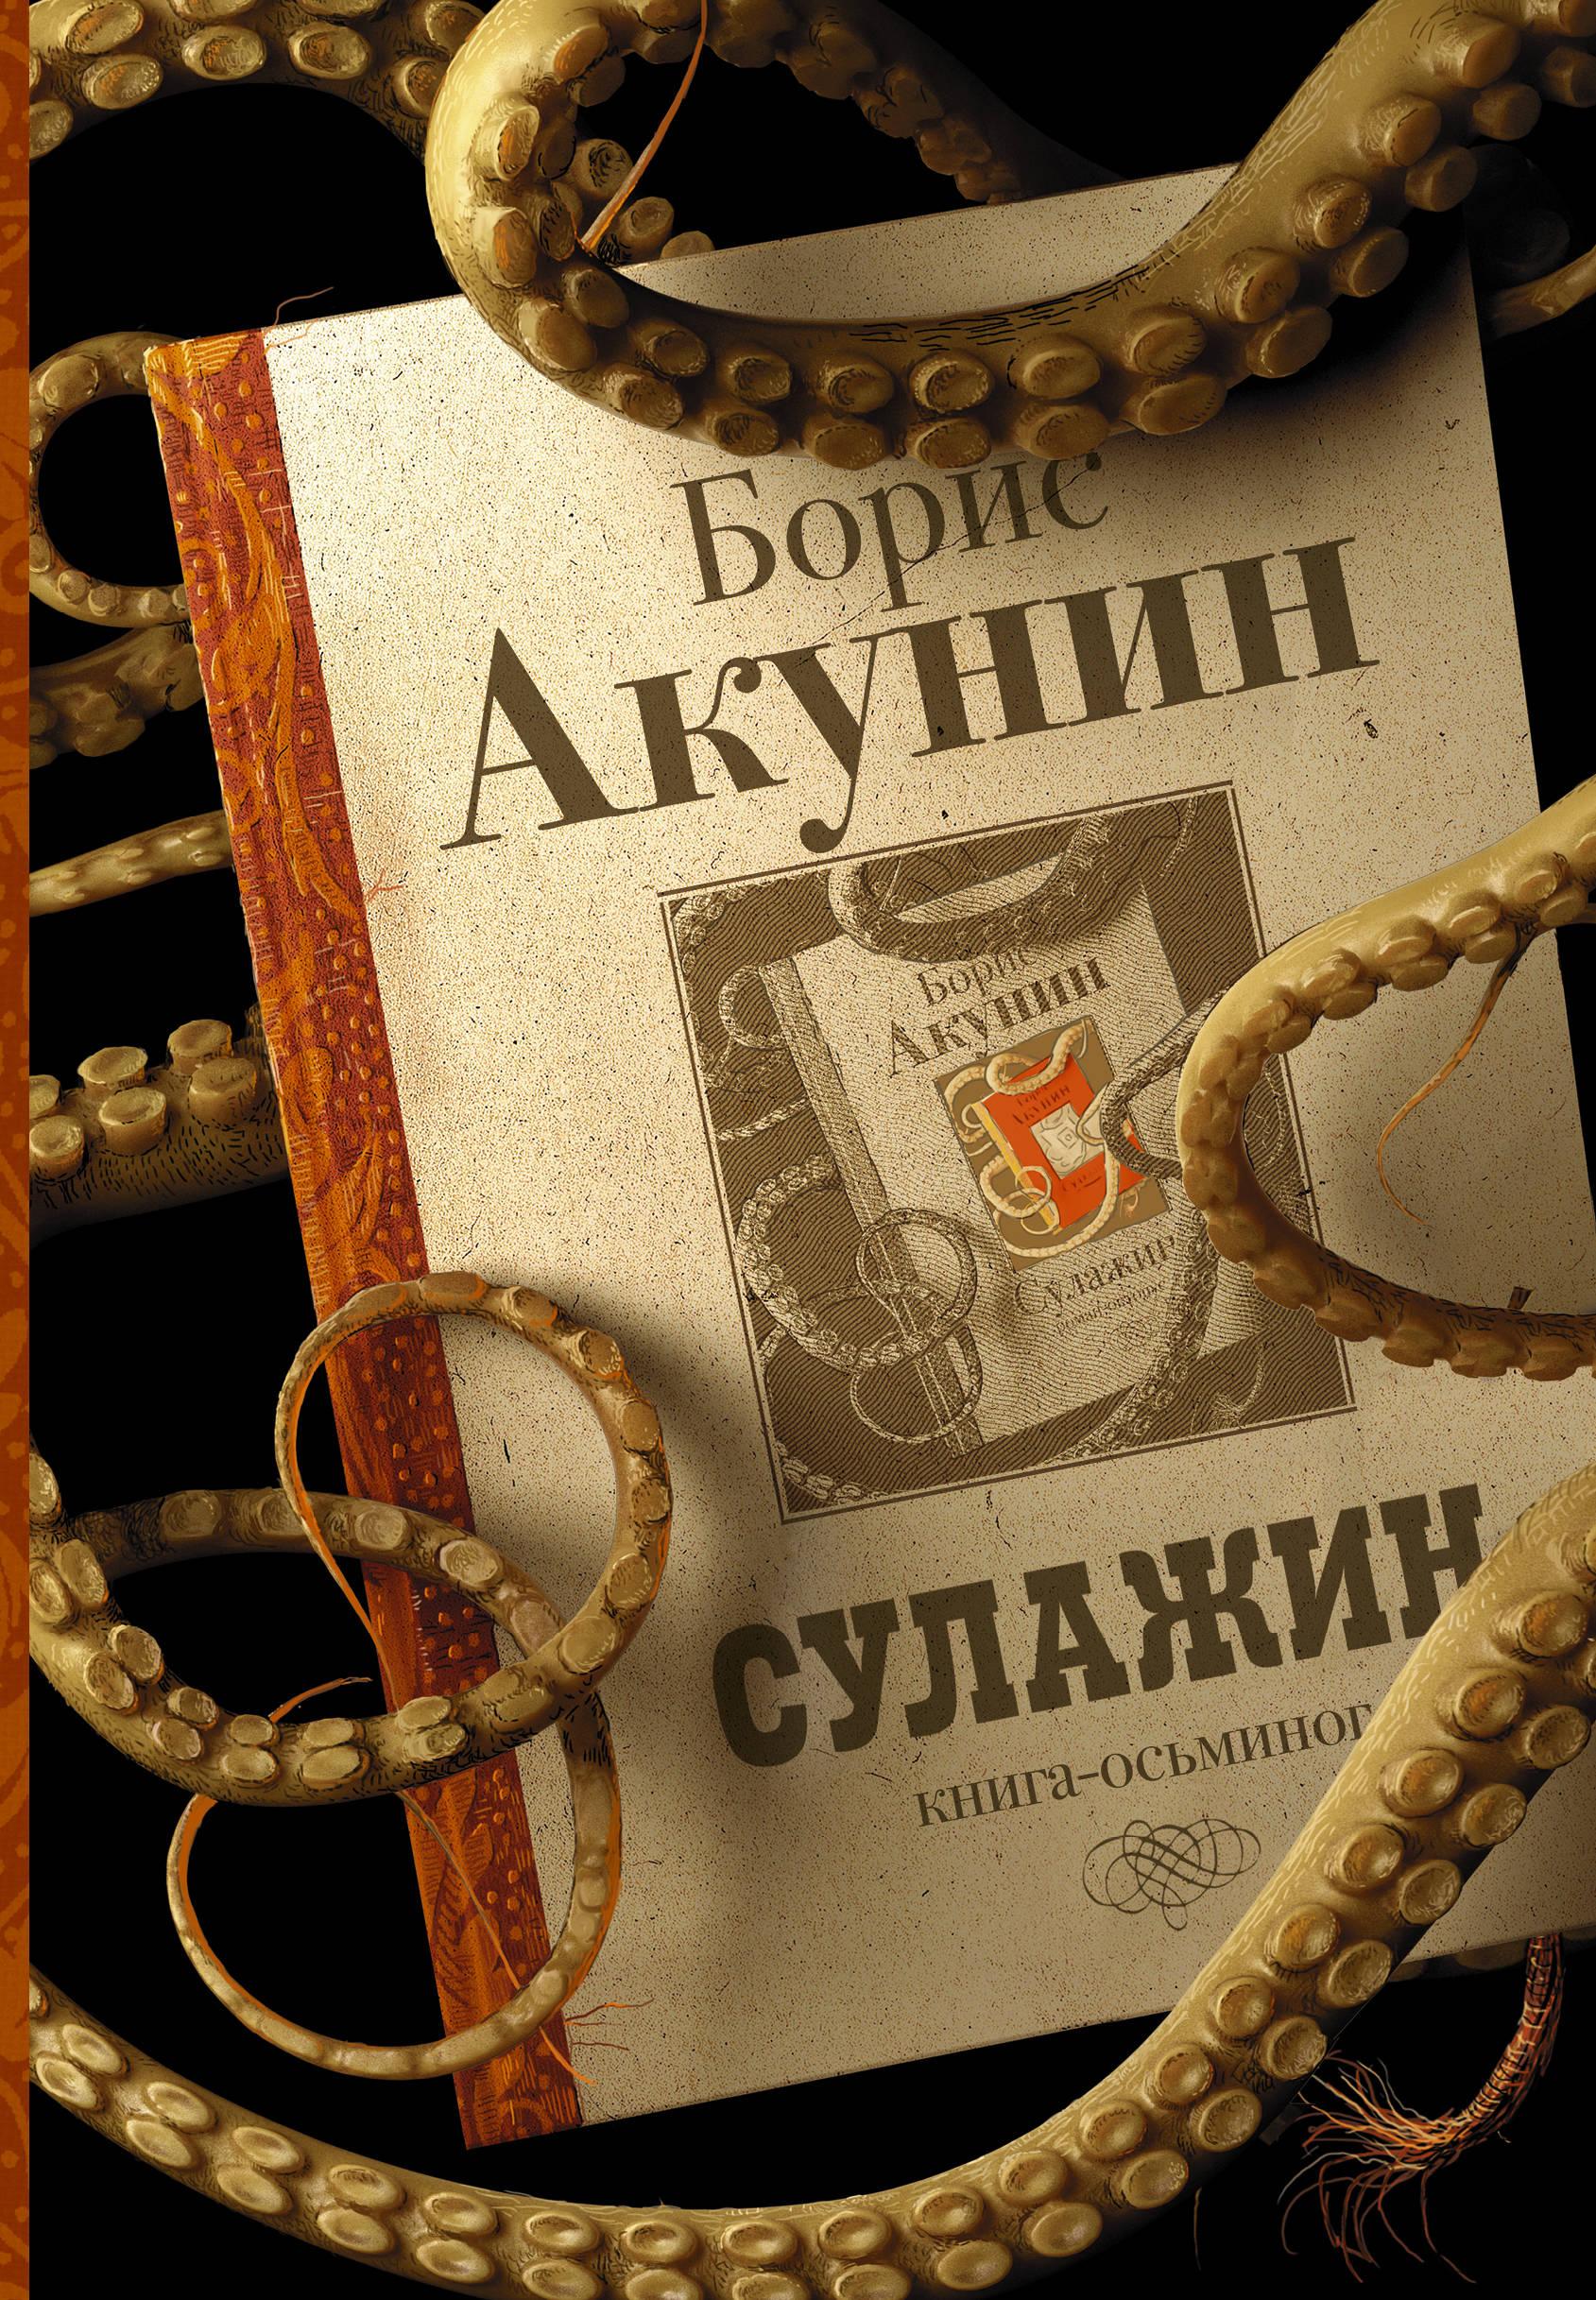 Акунин Борис Сулажин